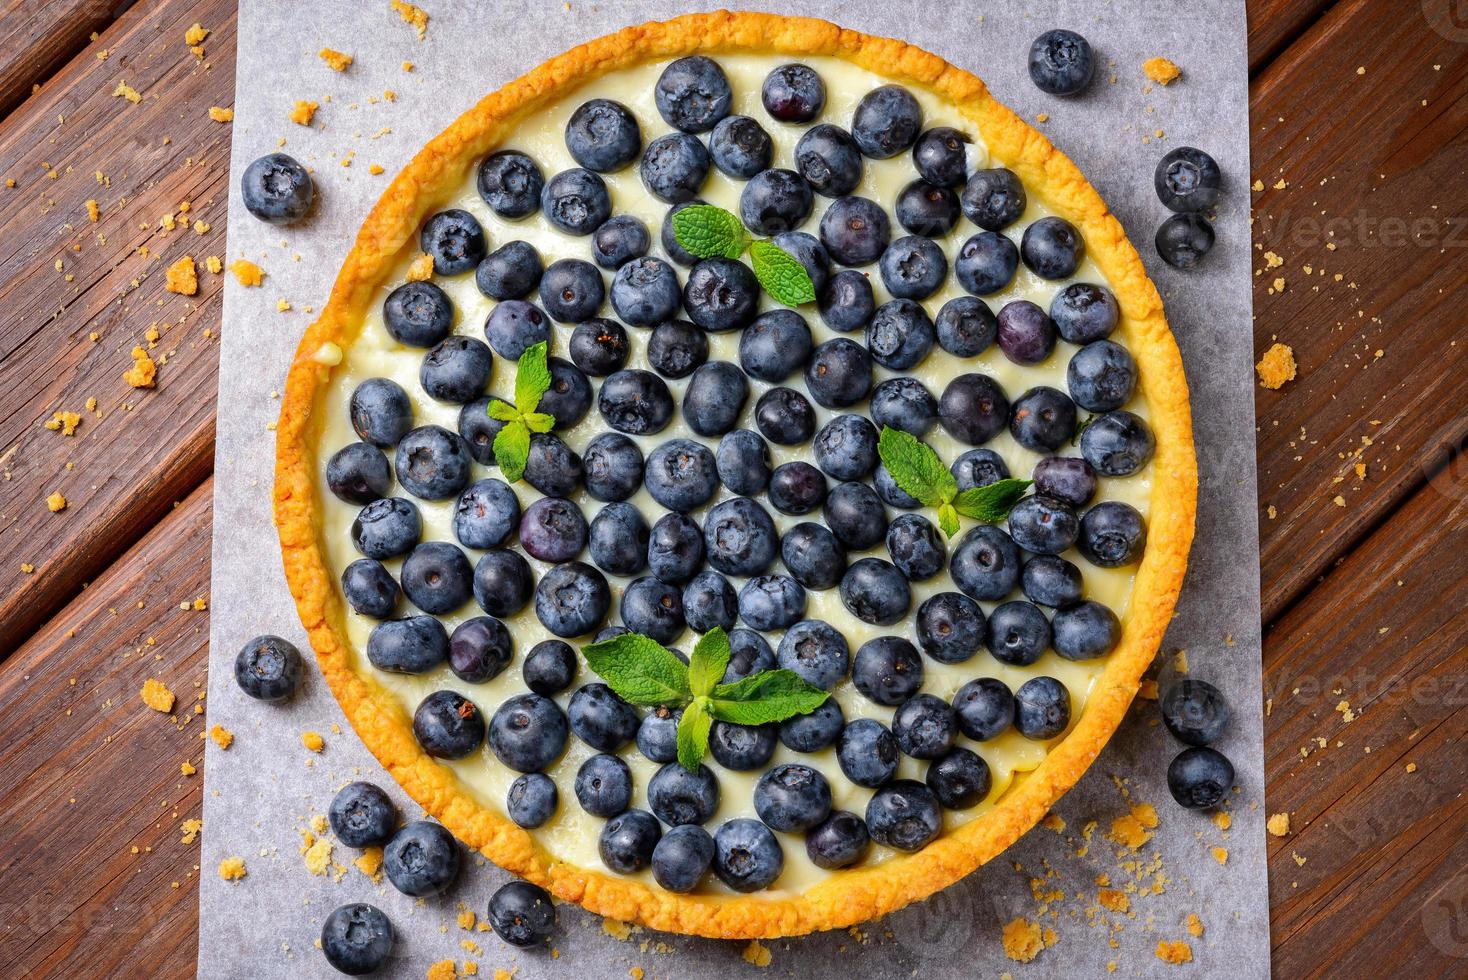 blåbärssyrta på vintage träbakgrund foto